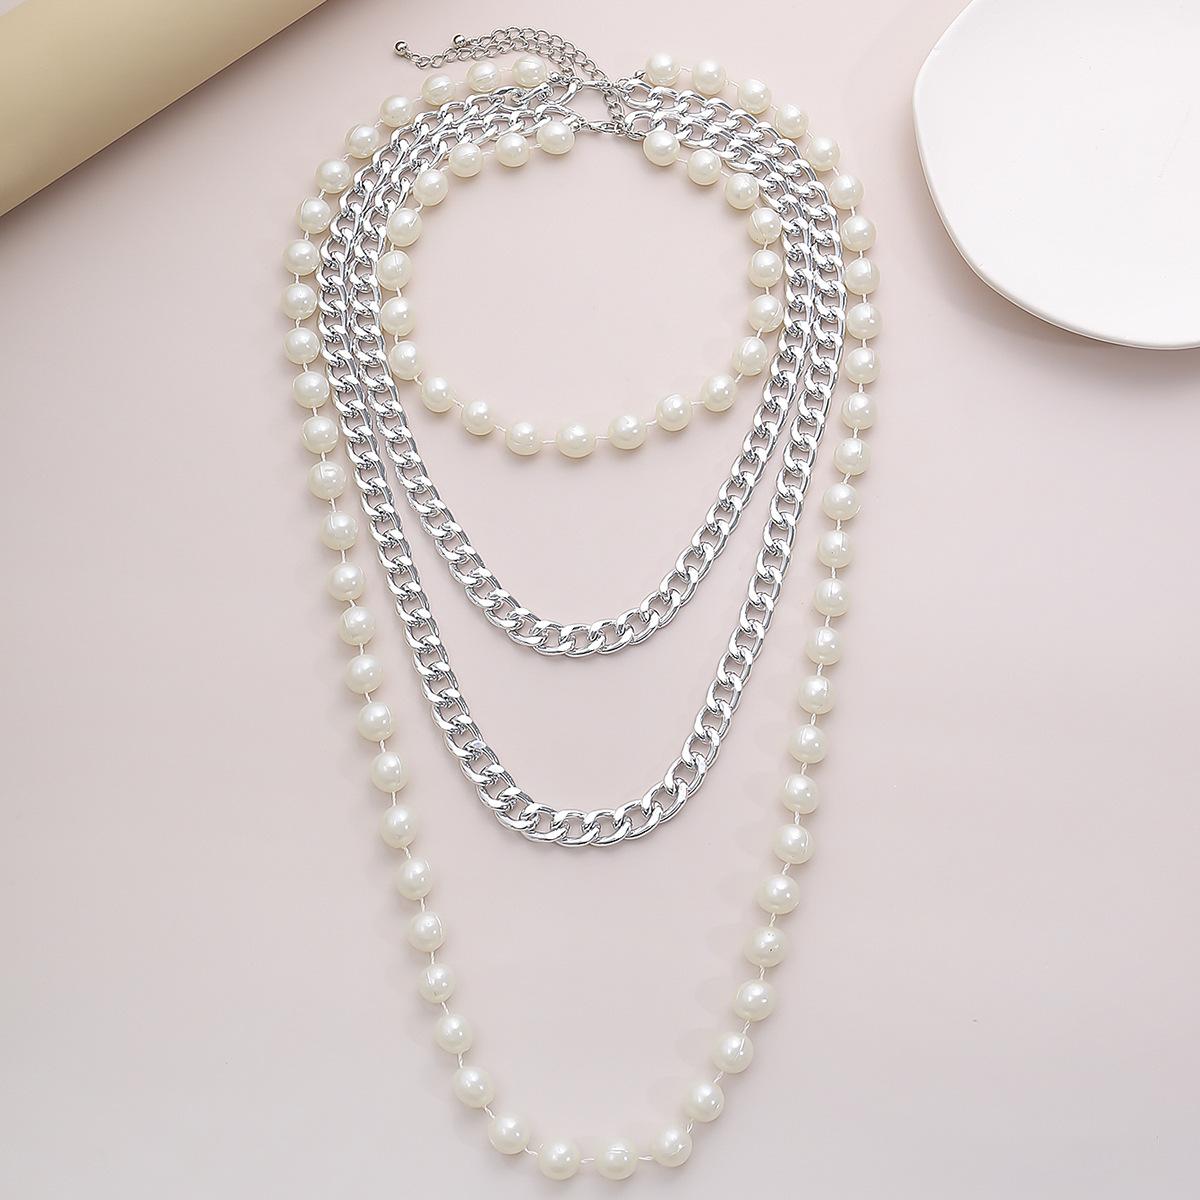 fashion jewelry punk personality fashion chain necklace exaggerated beaded long U-shaped tassel necklace wholesale nihaojewelry NHXR228300